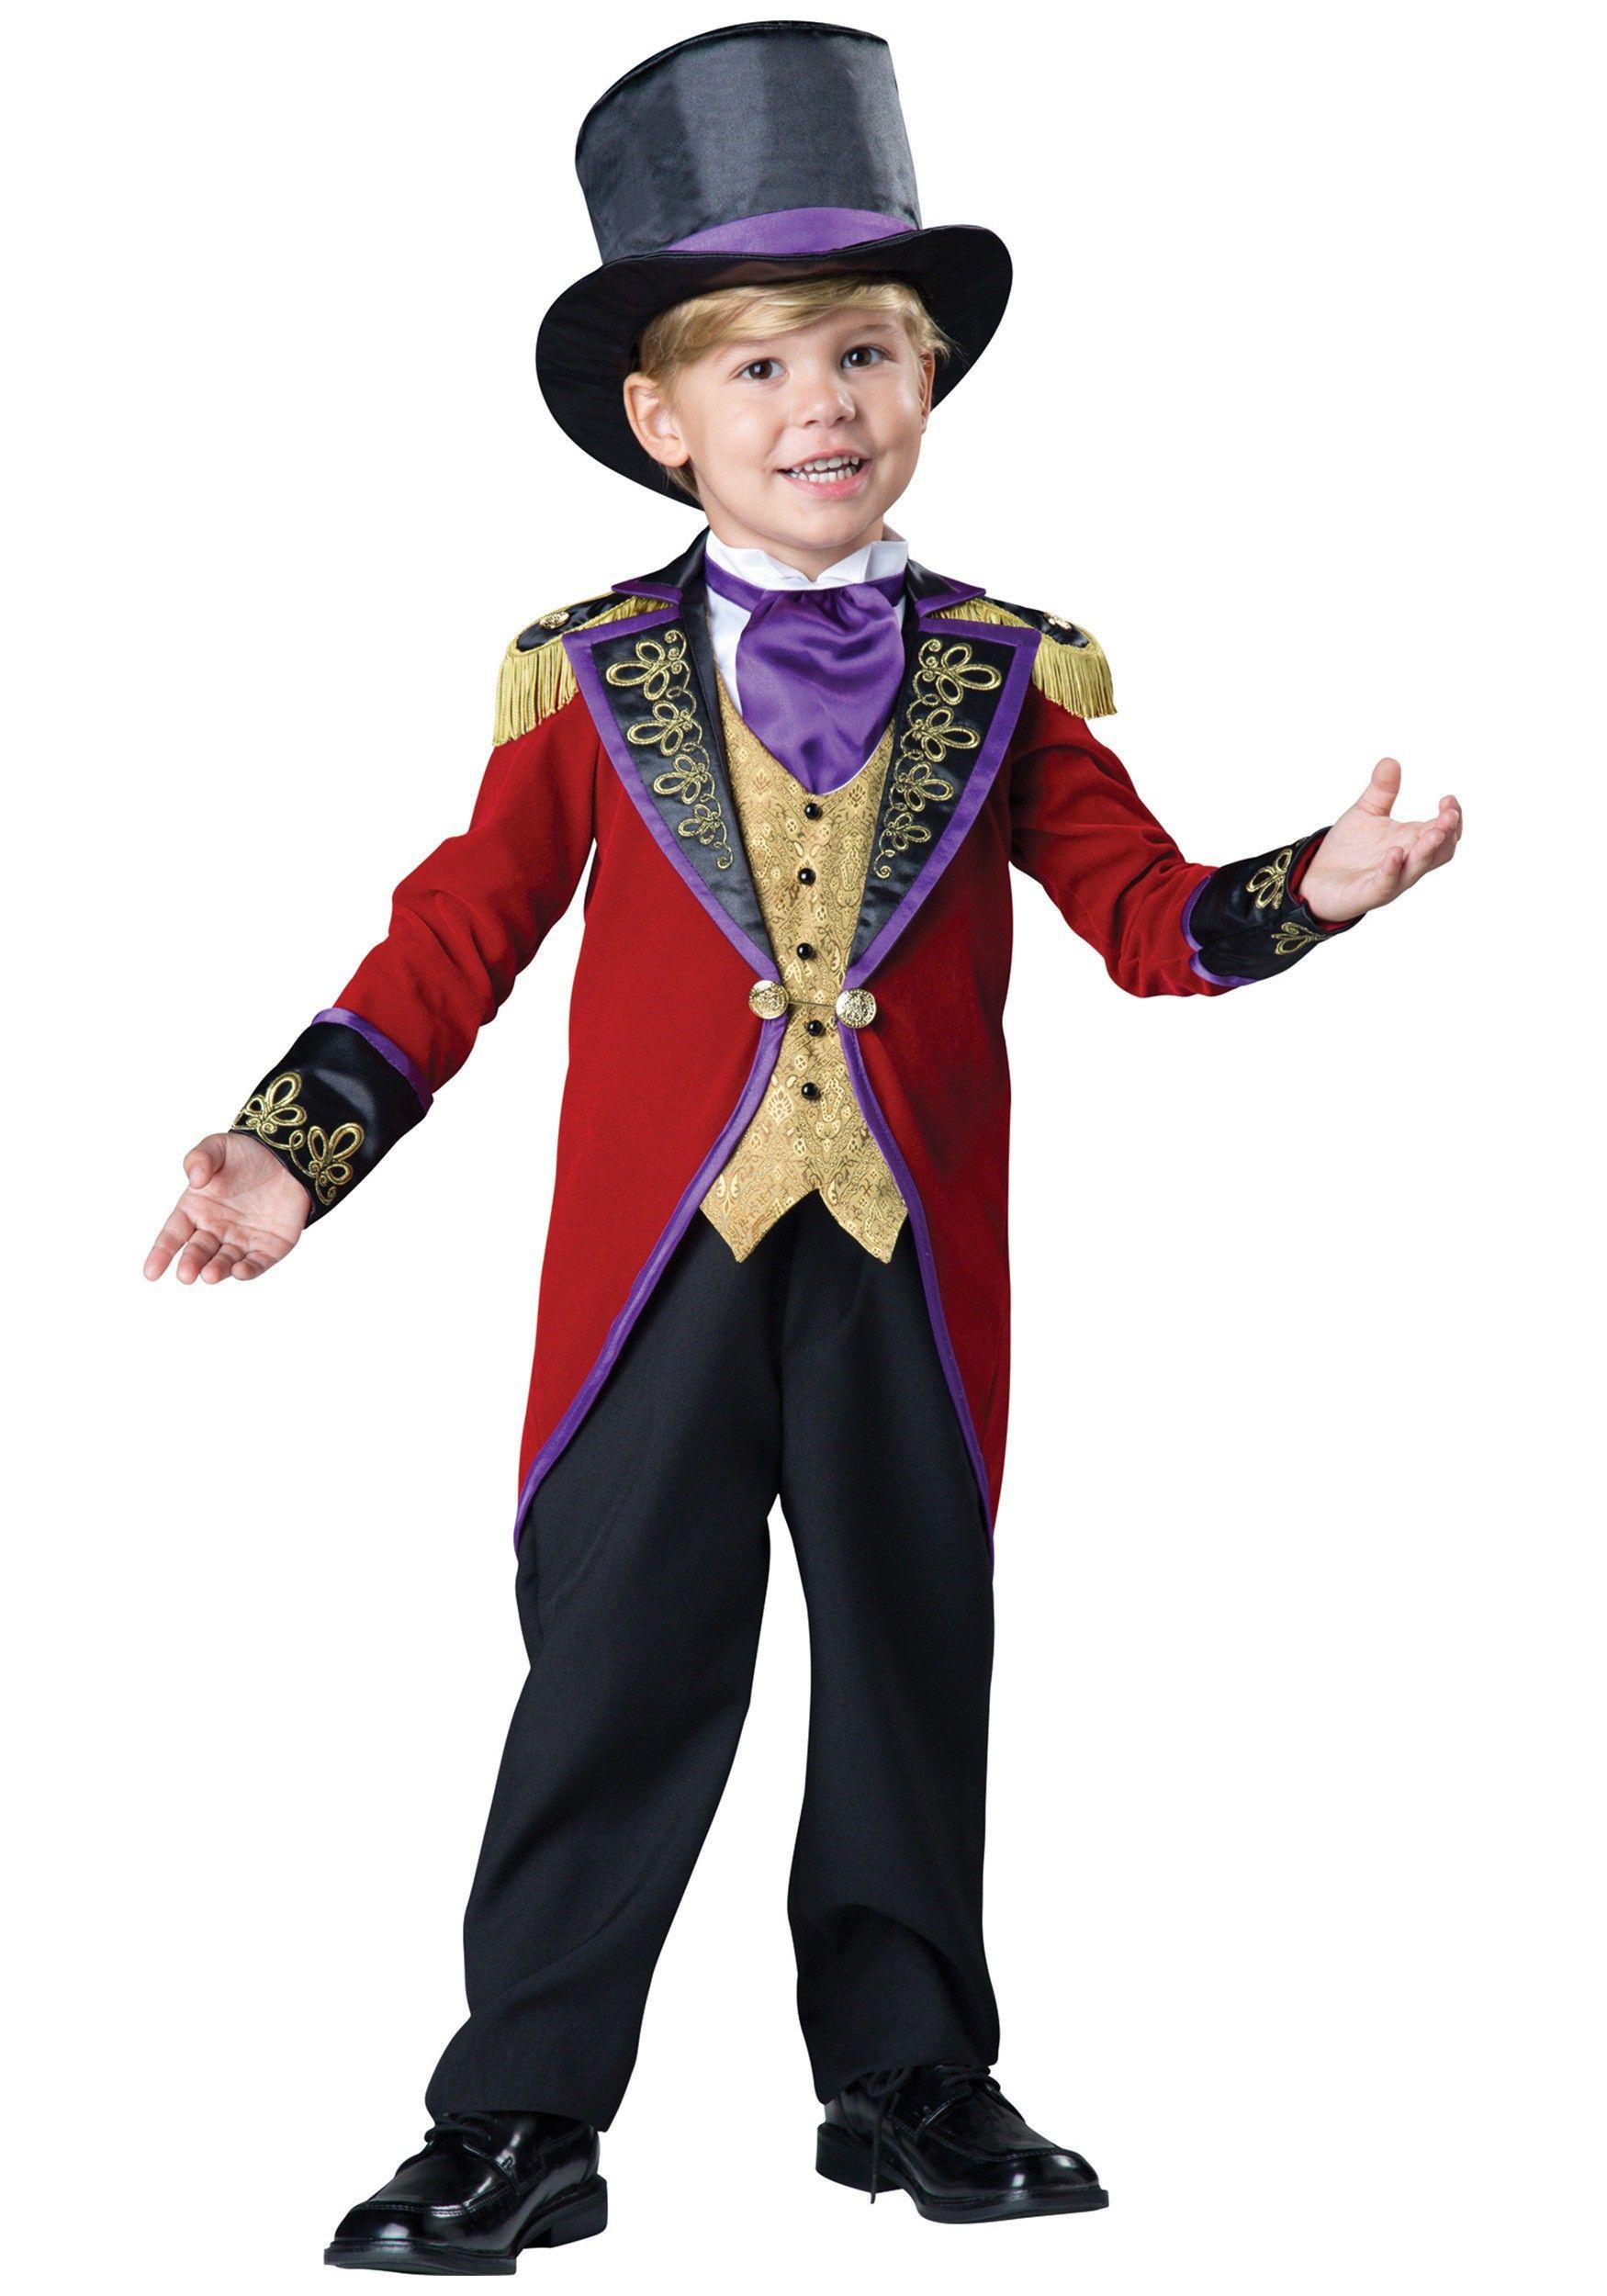 Toddler Ringmaster Costume | Ringmaster costume, Costumes and ...